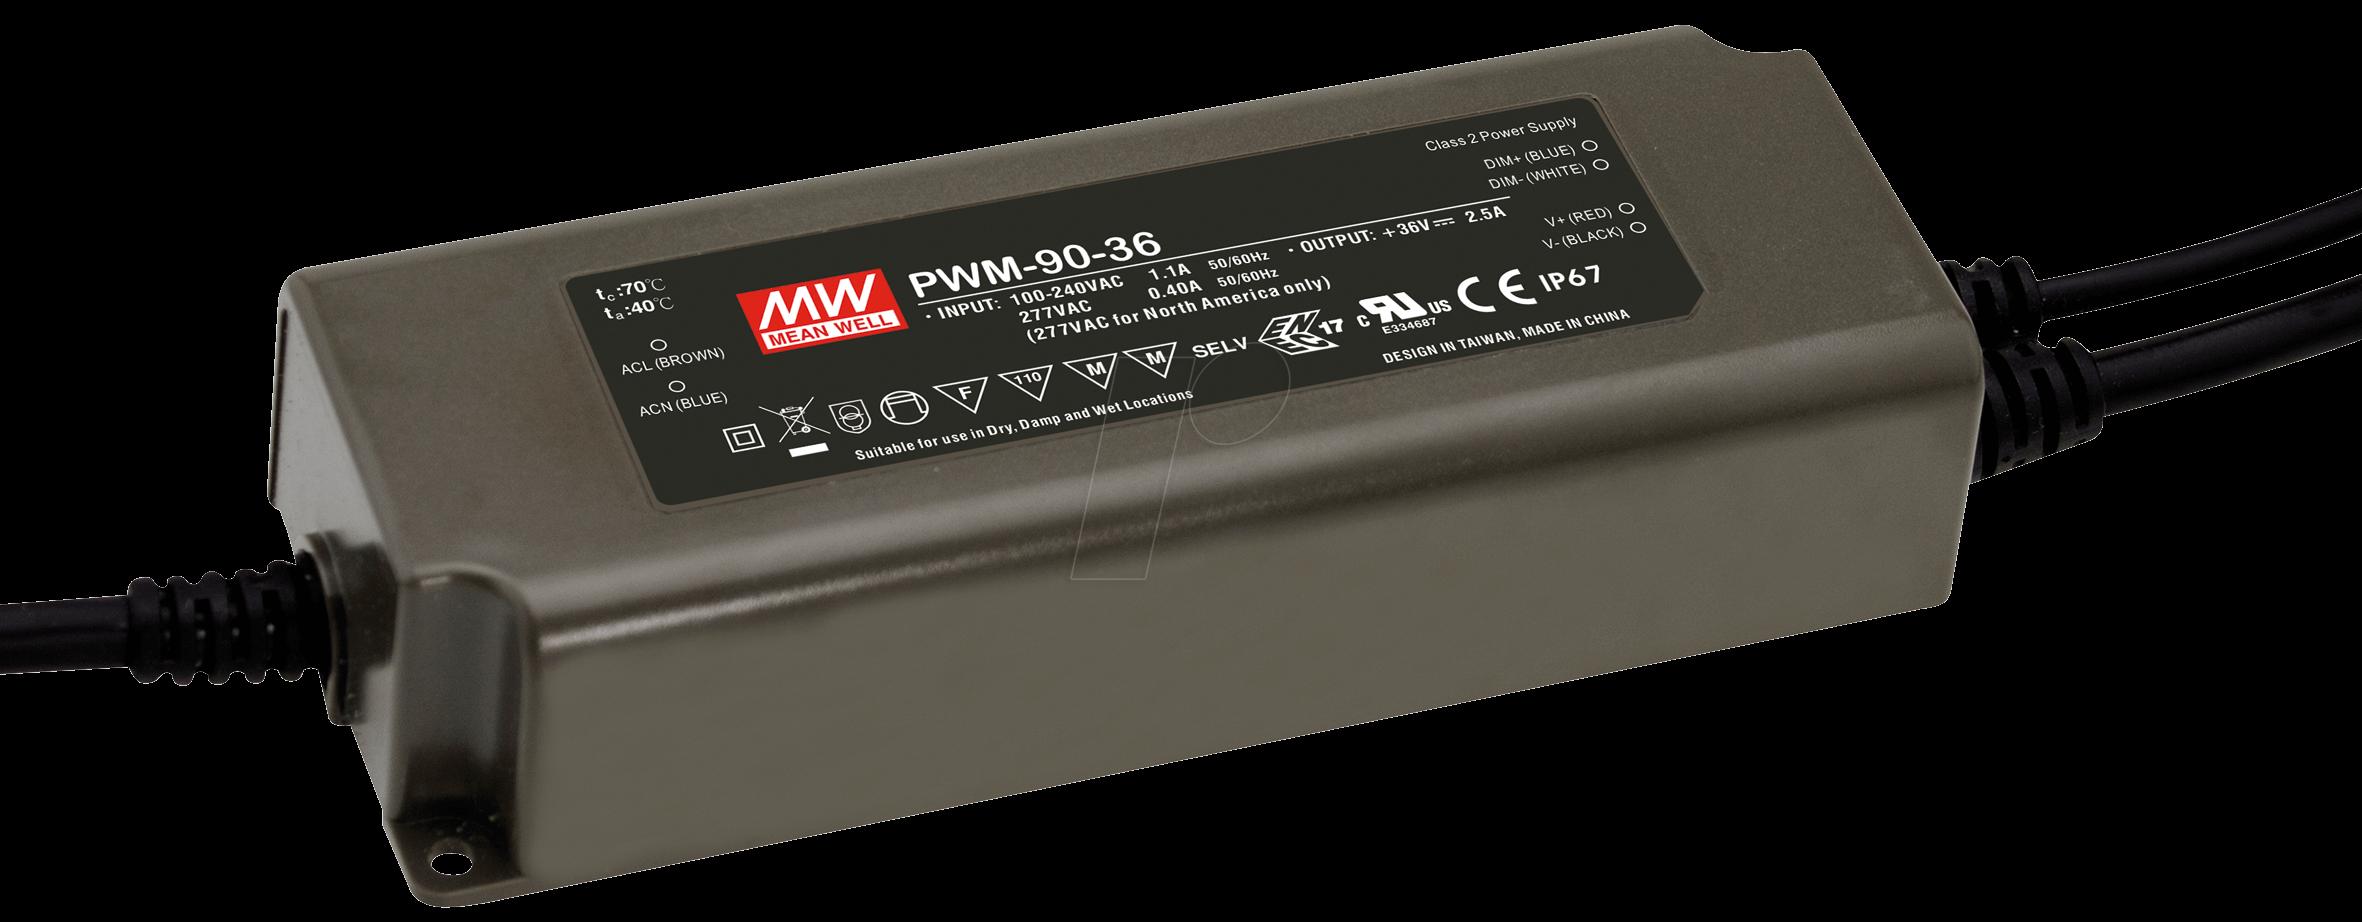 MW PWM-90-48 - LED-Switching Power Supplies, PWM-90, 48 VDC, 1,88 A